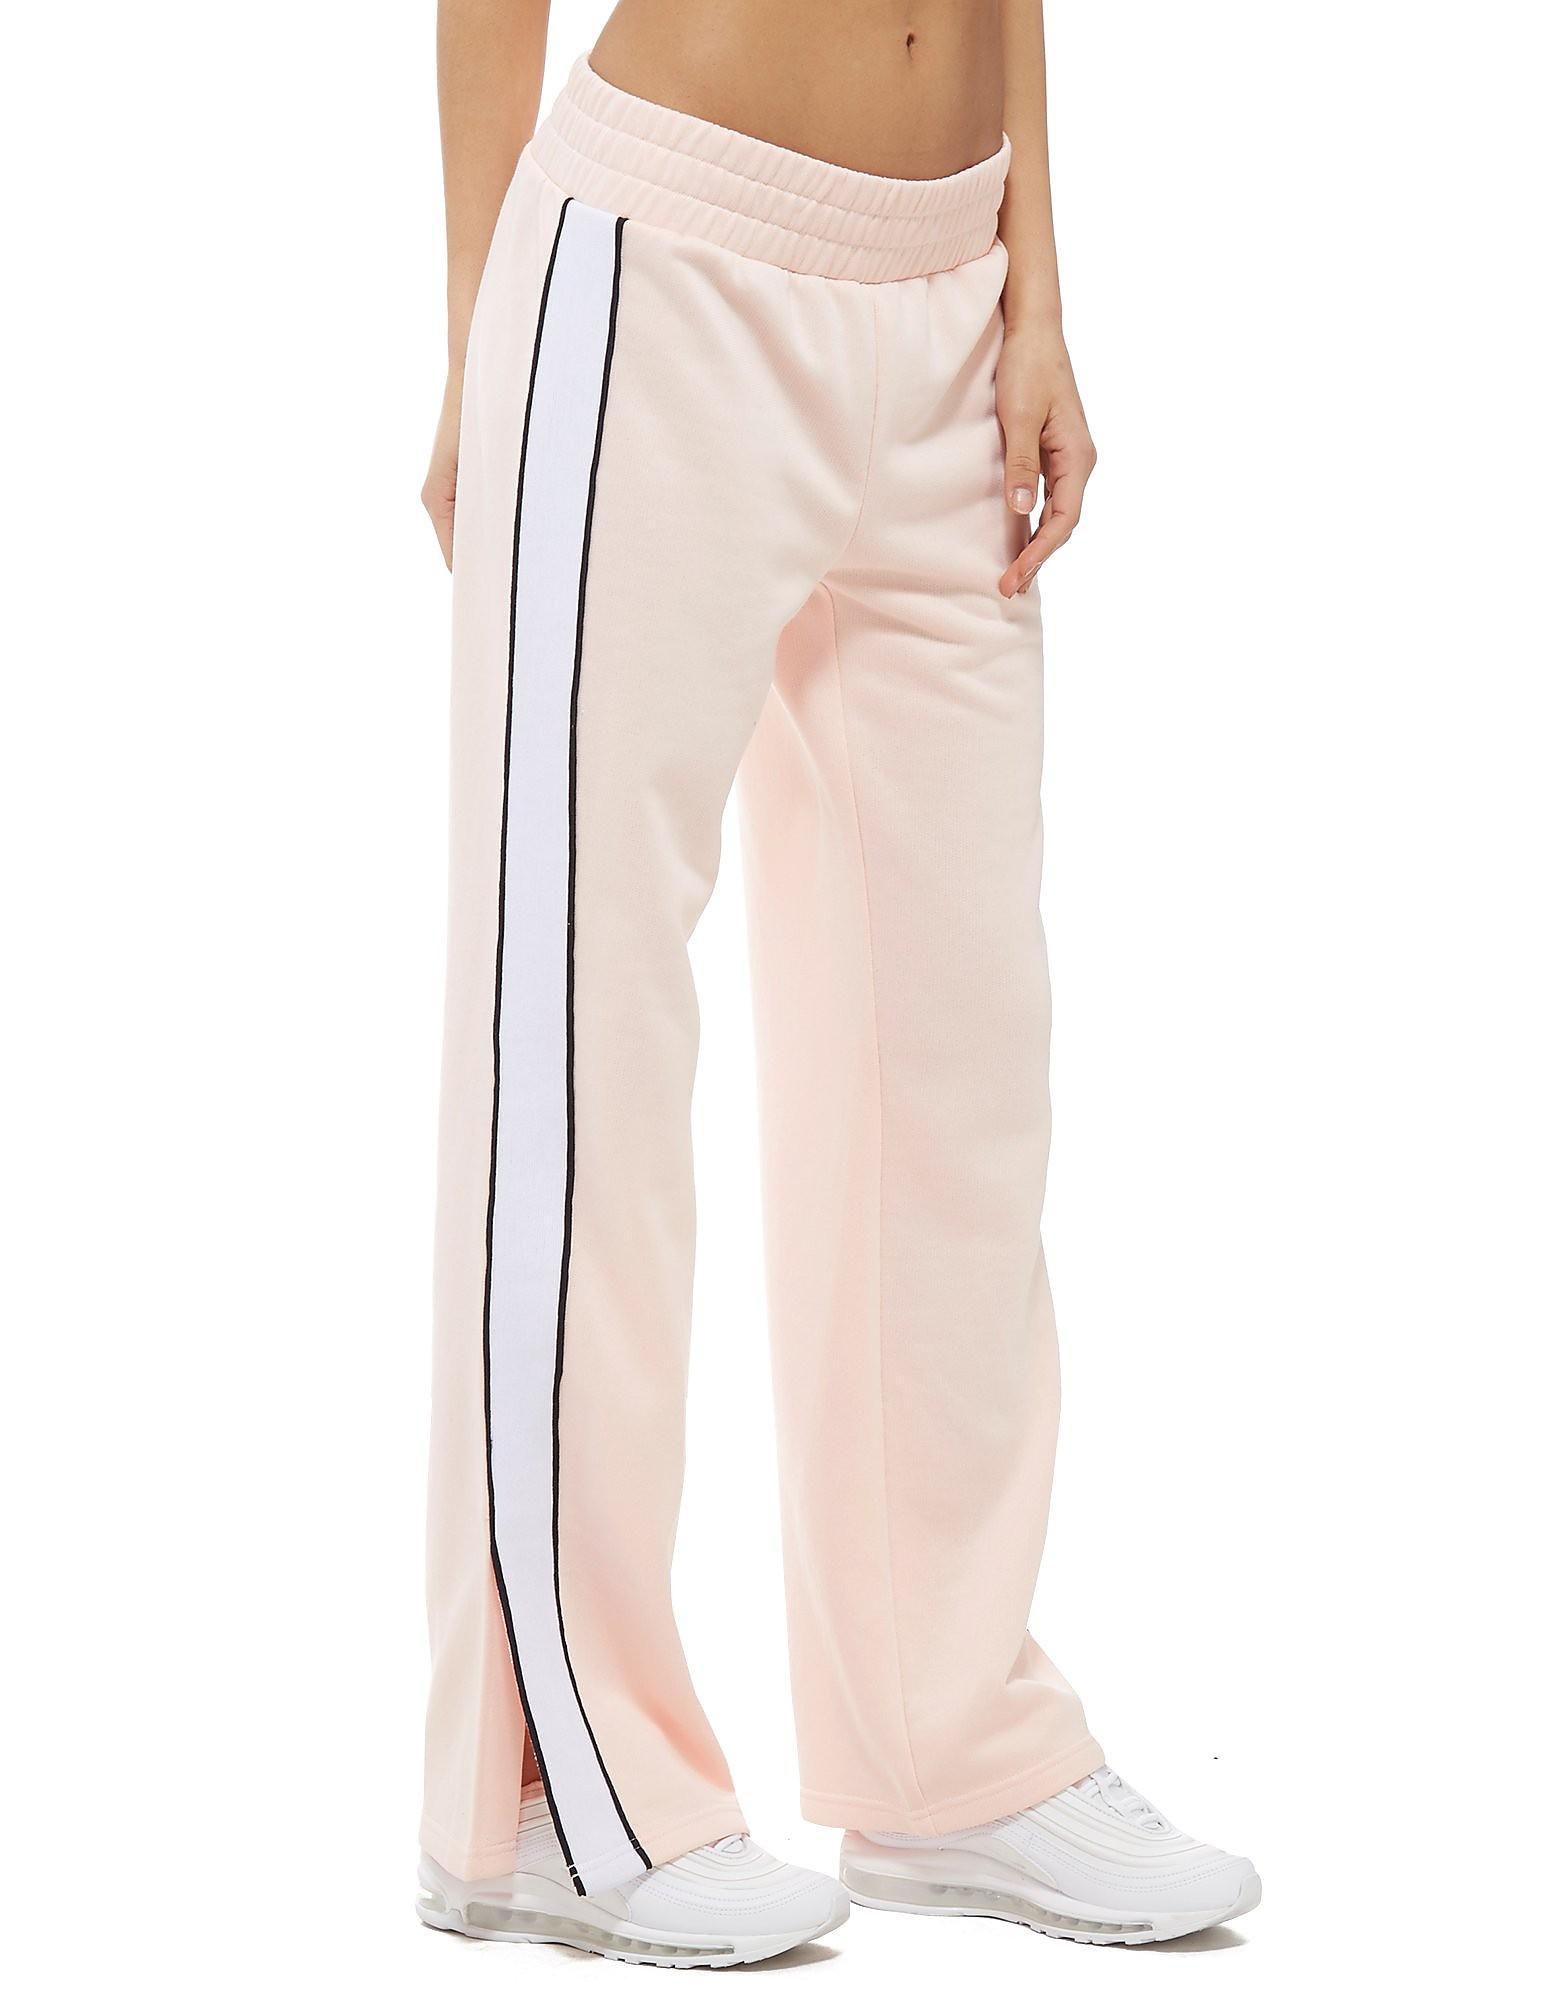 Juicy by Juicy Couture Wide Leg Pants